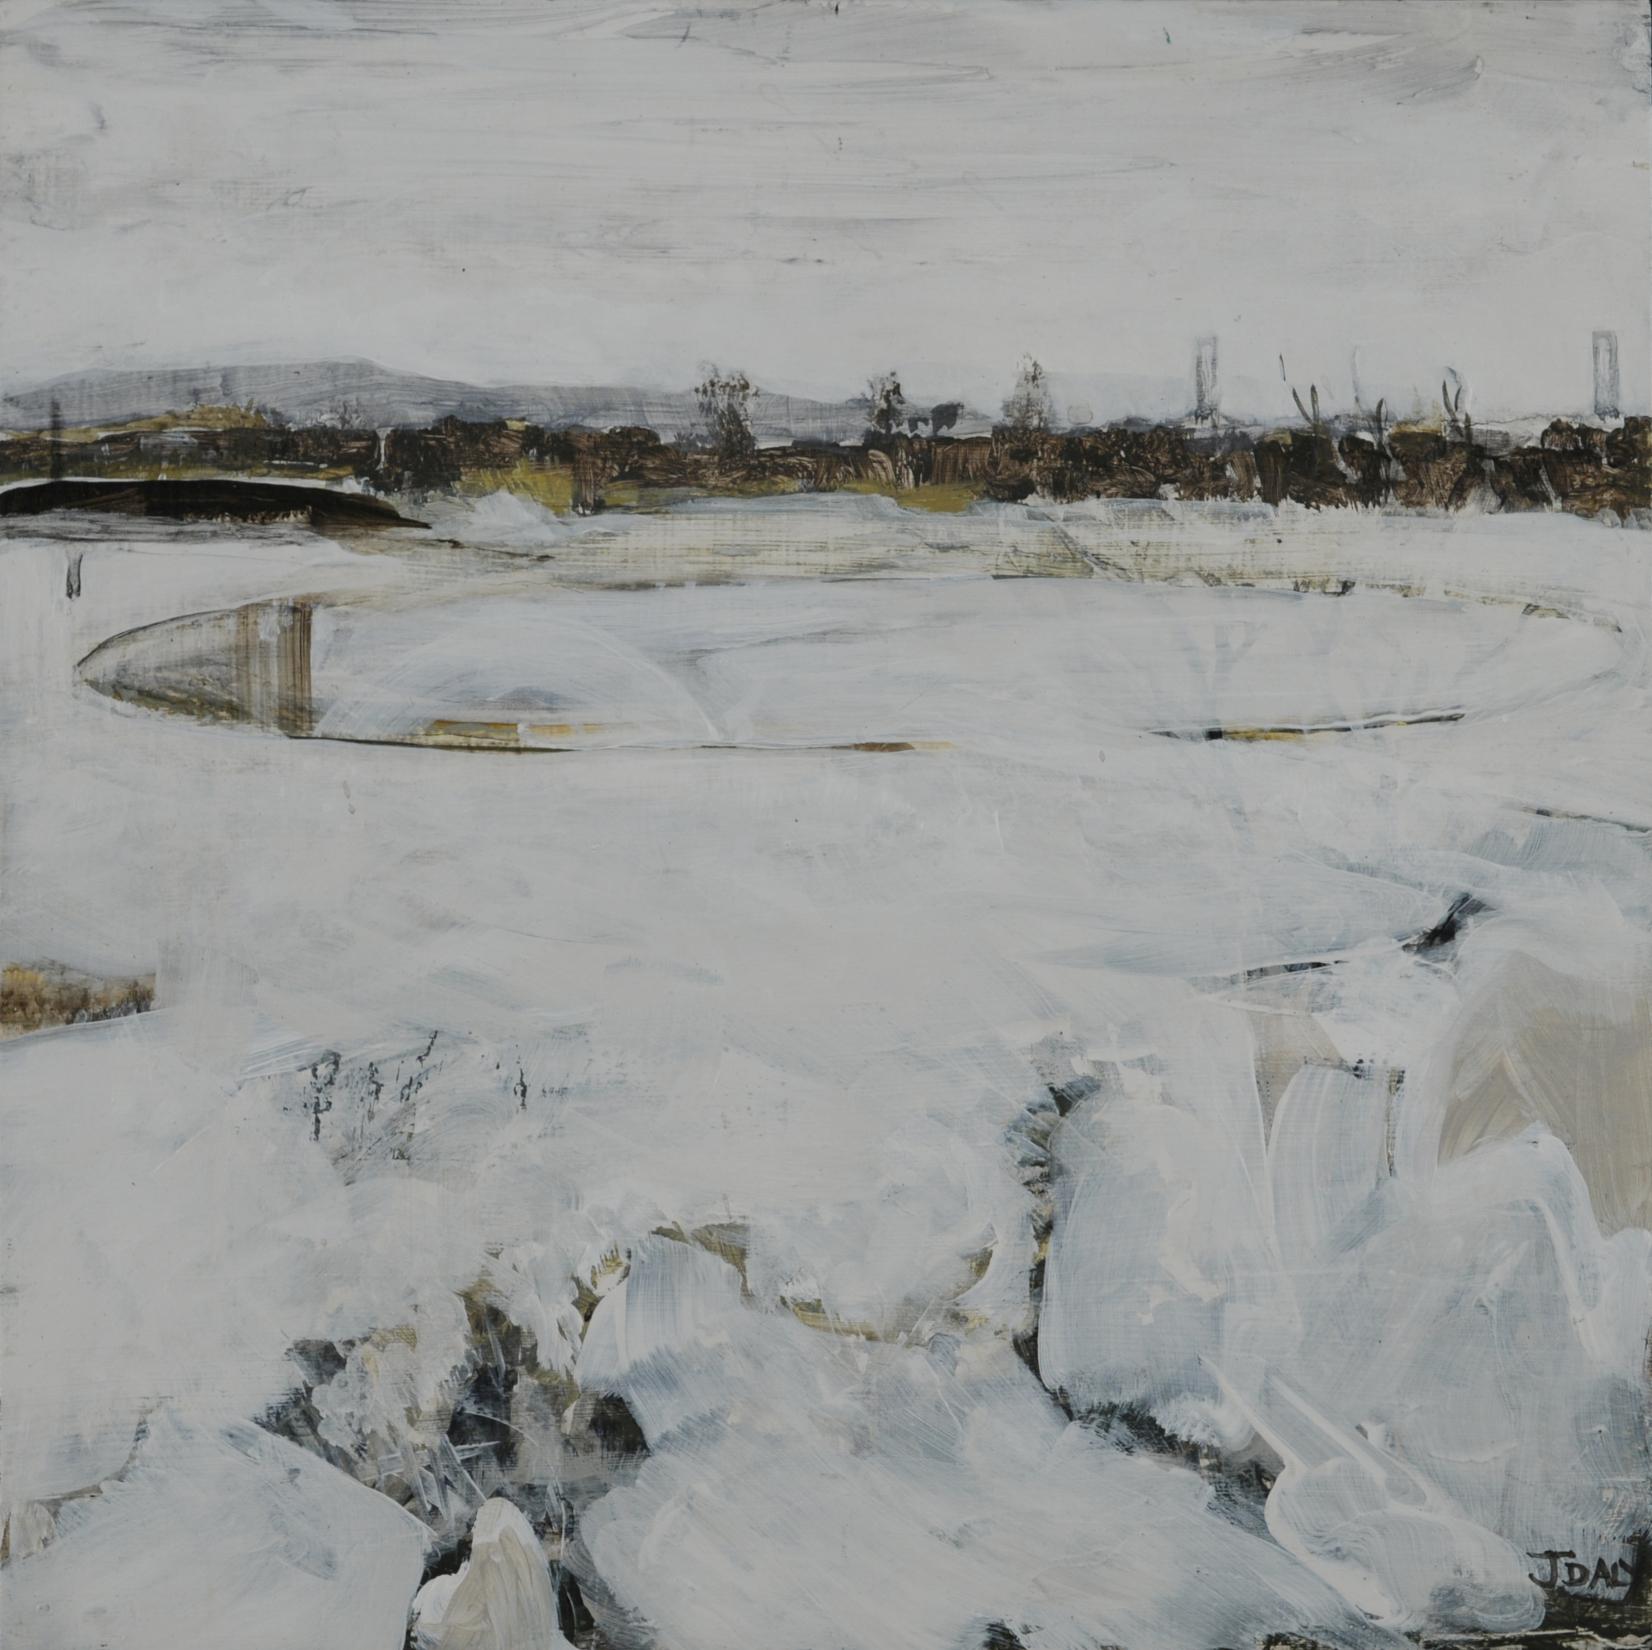 John Daly,  Mooring V , Acrylic on panel, 12x12